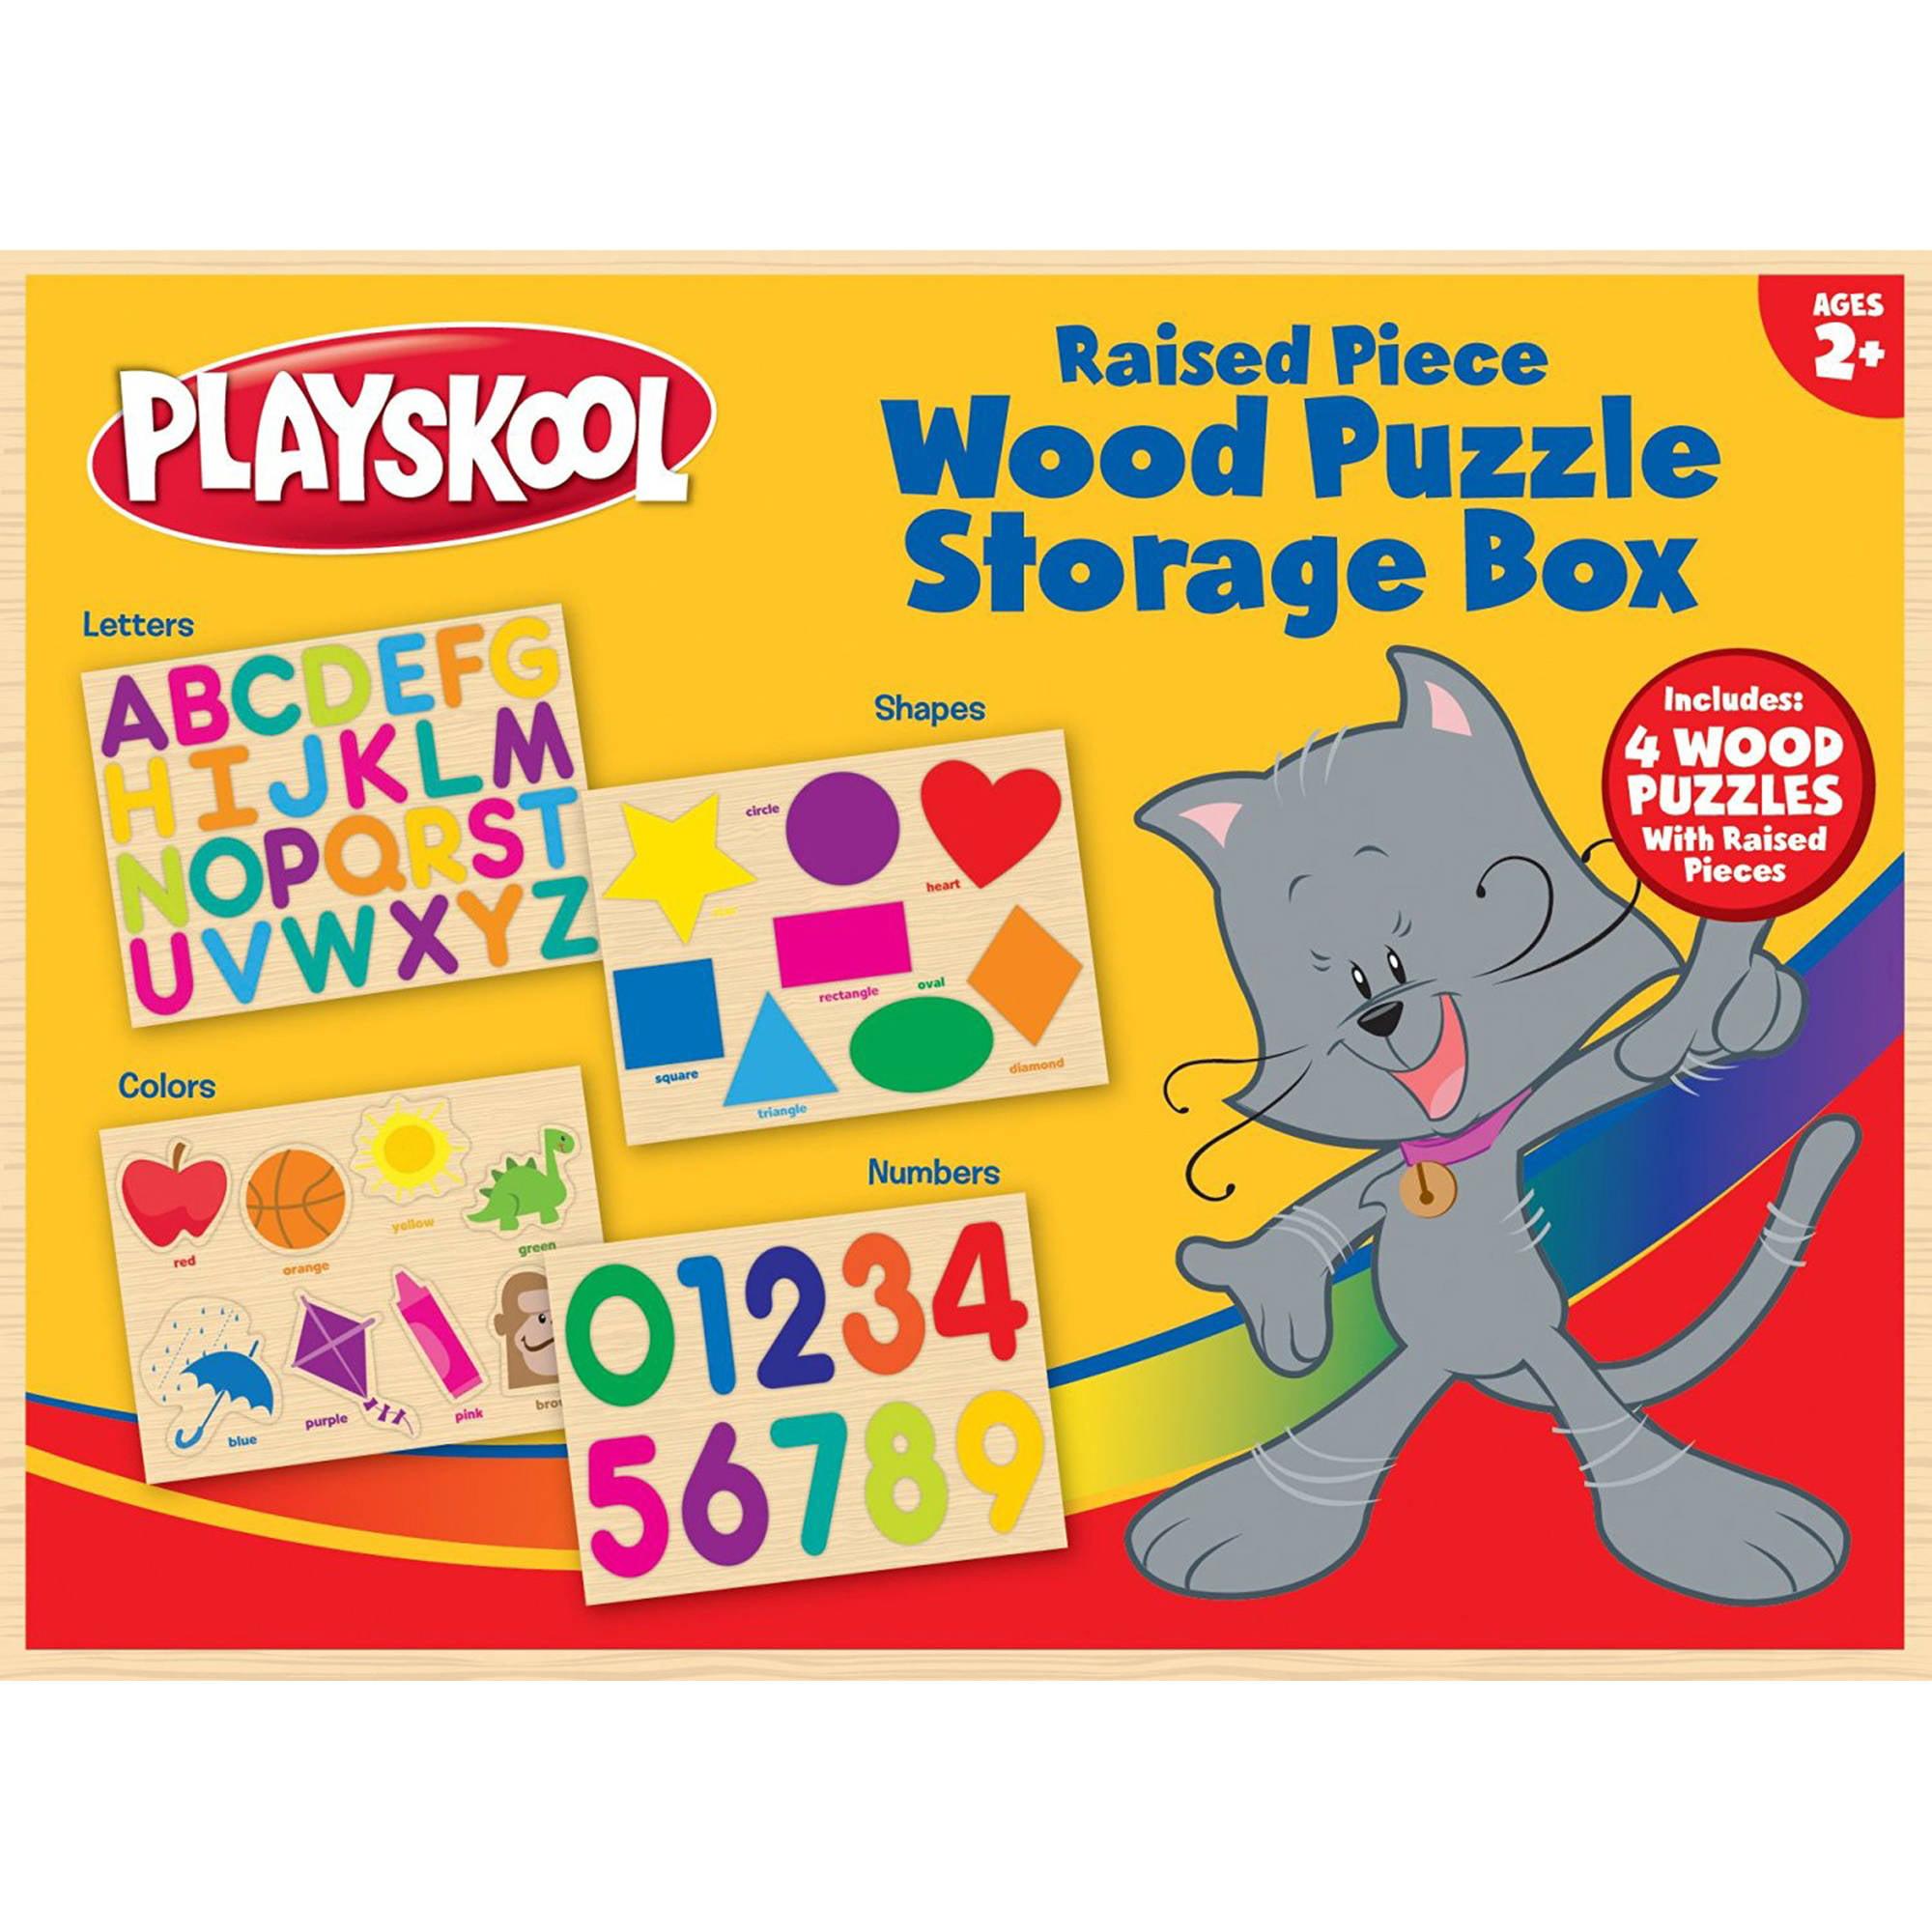 Playskool Wood Puzzle Storage Box by Leap Year Publishing, LLC